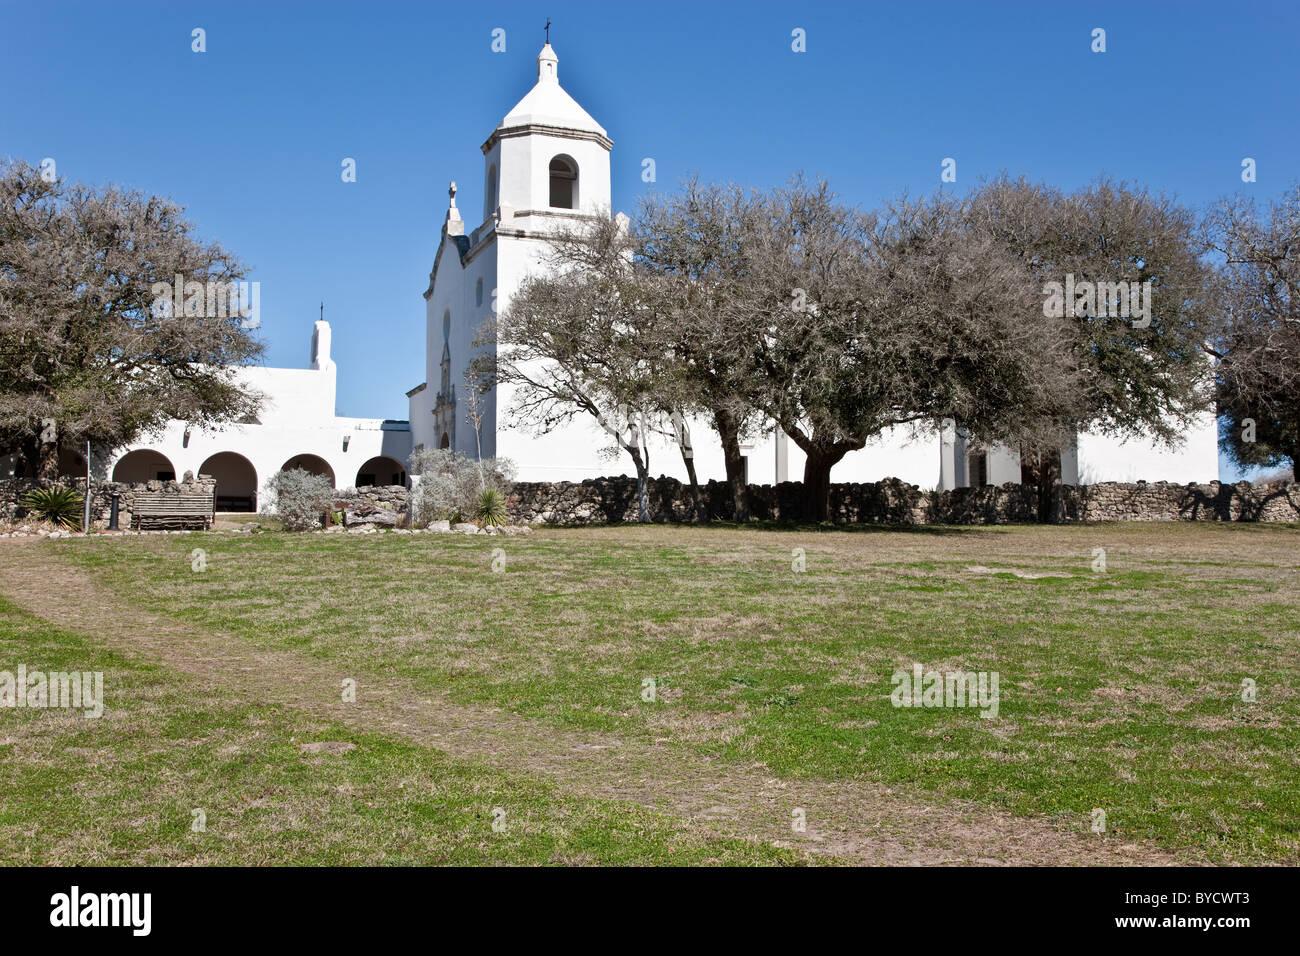 Mission 'Espiritu Santo'. - Stock Image